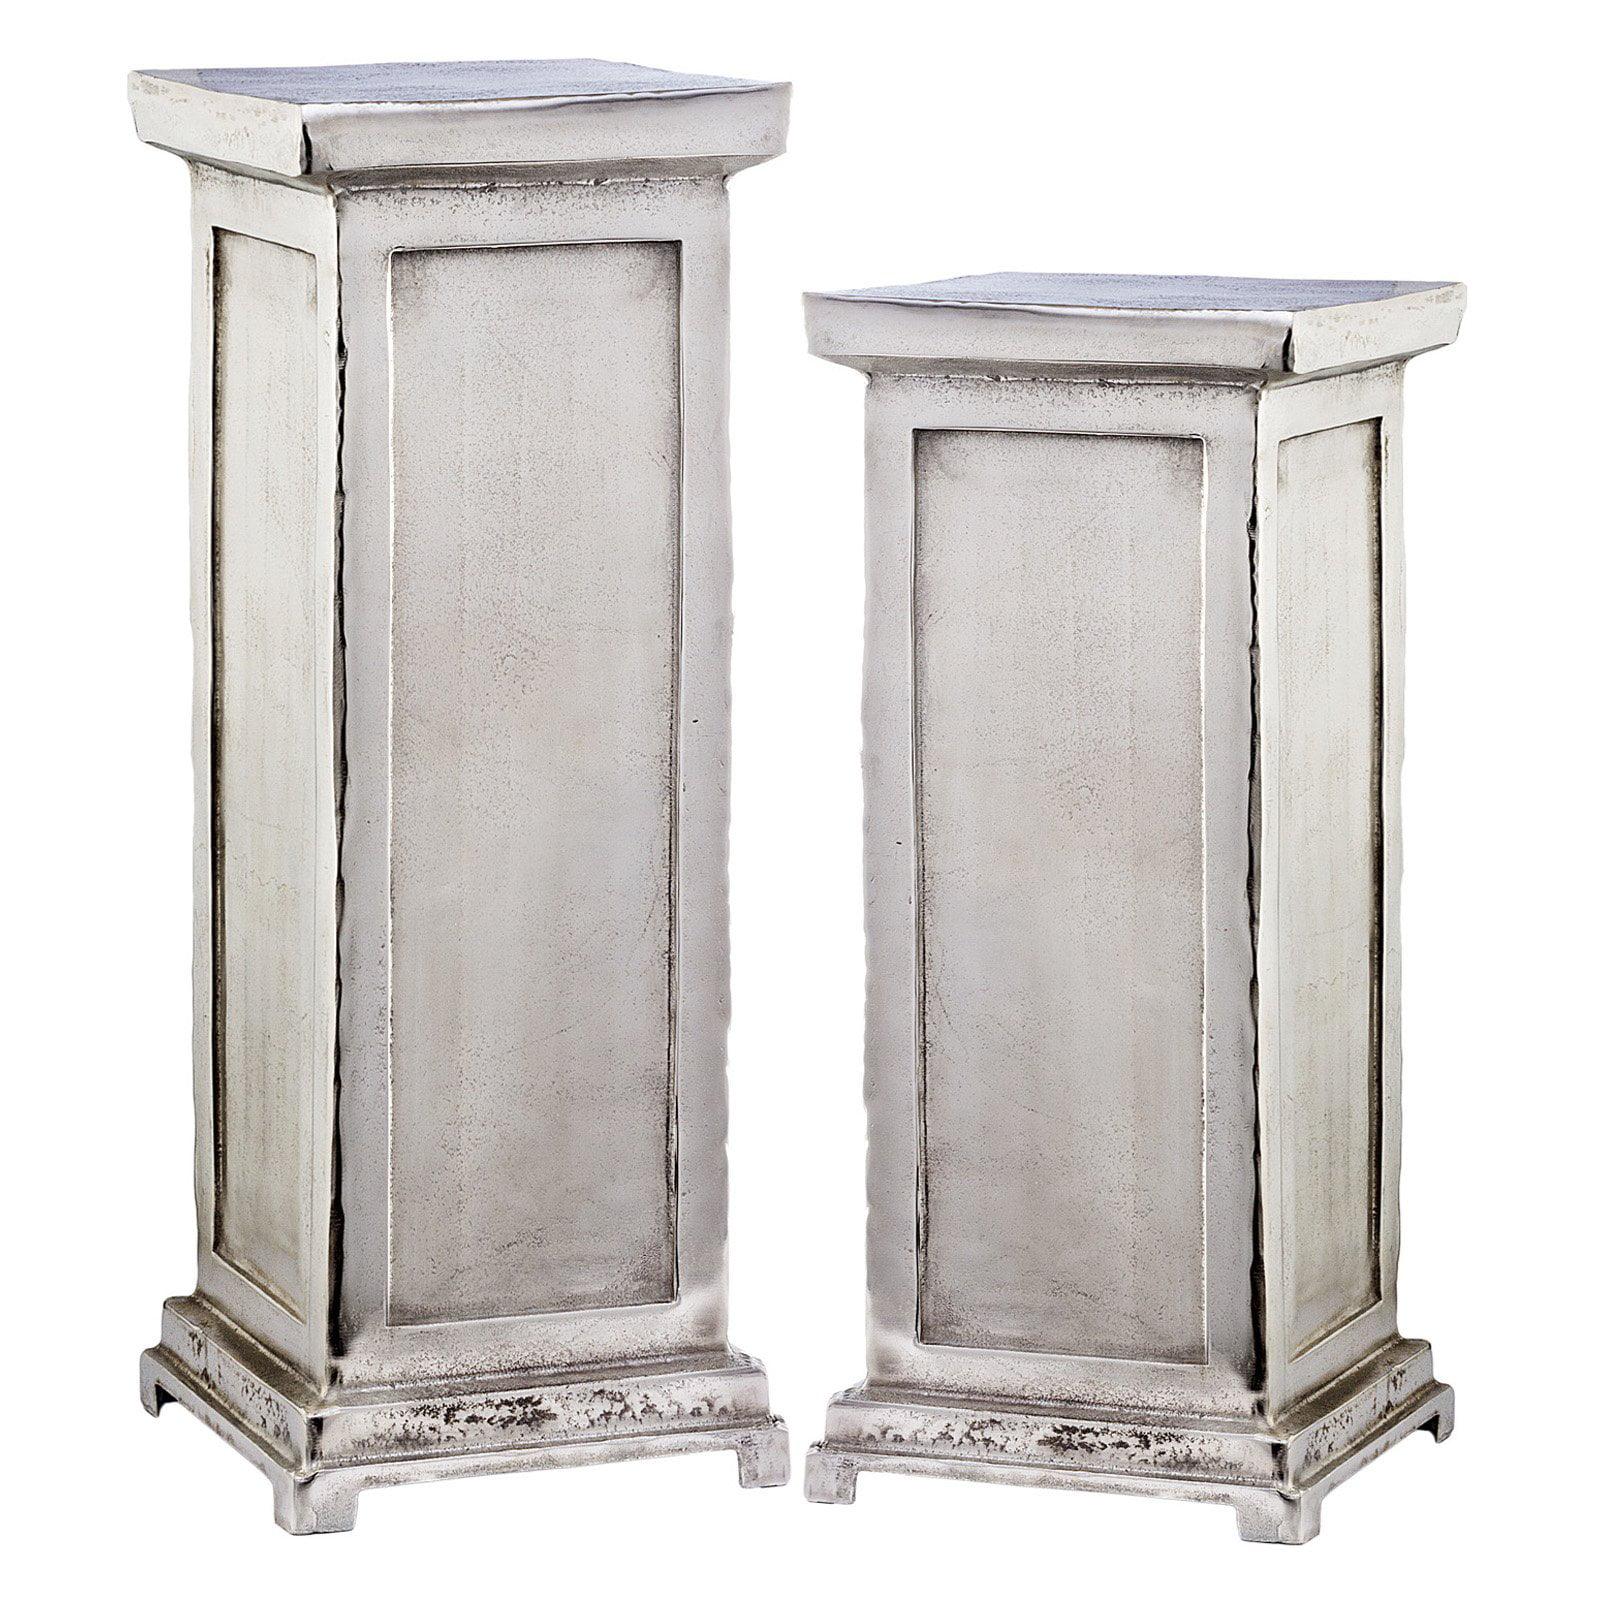 Modern Day Accents Peana Roman Pedestal Sculpture Plant Stand